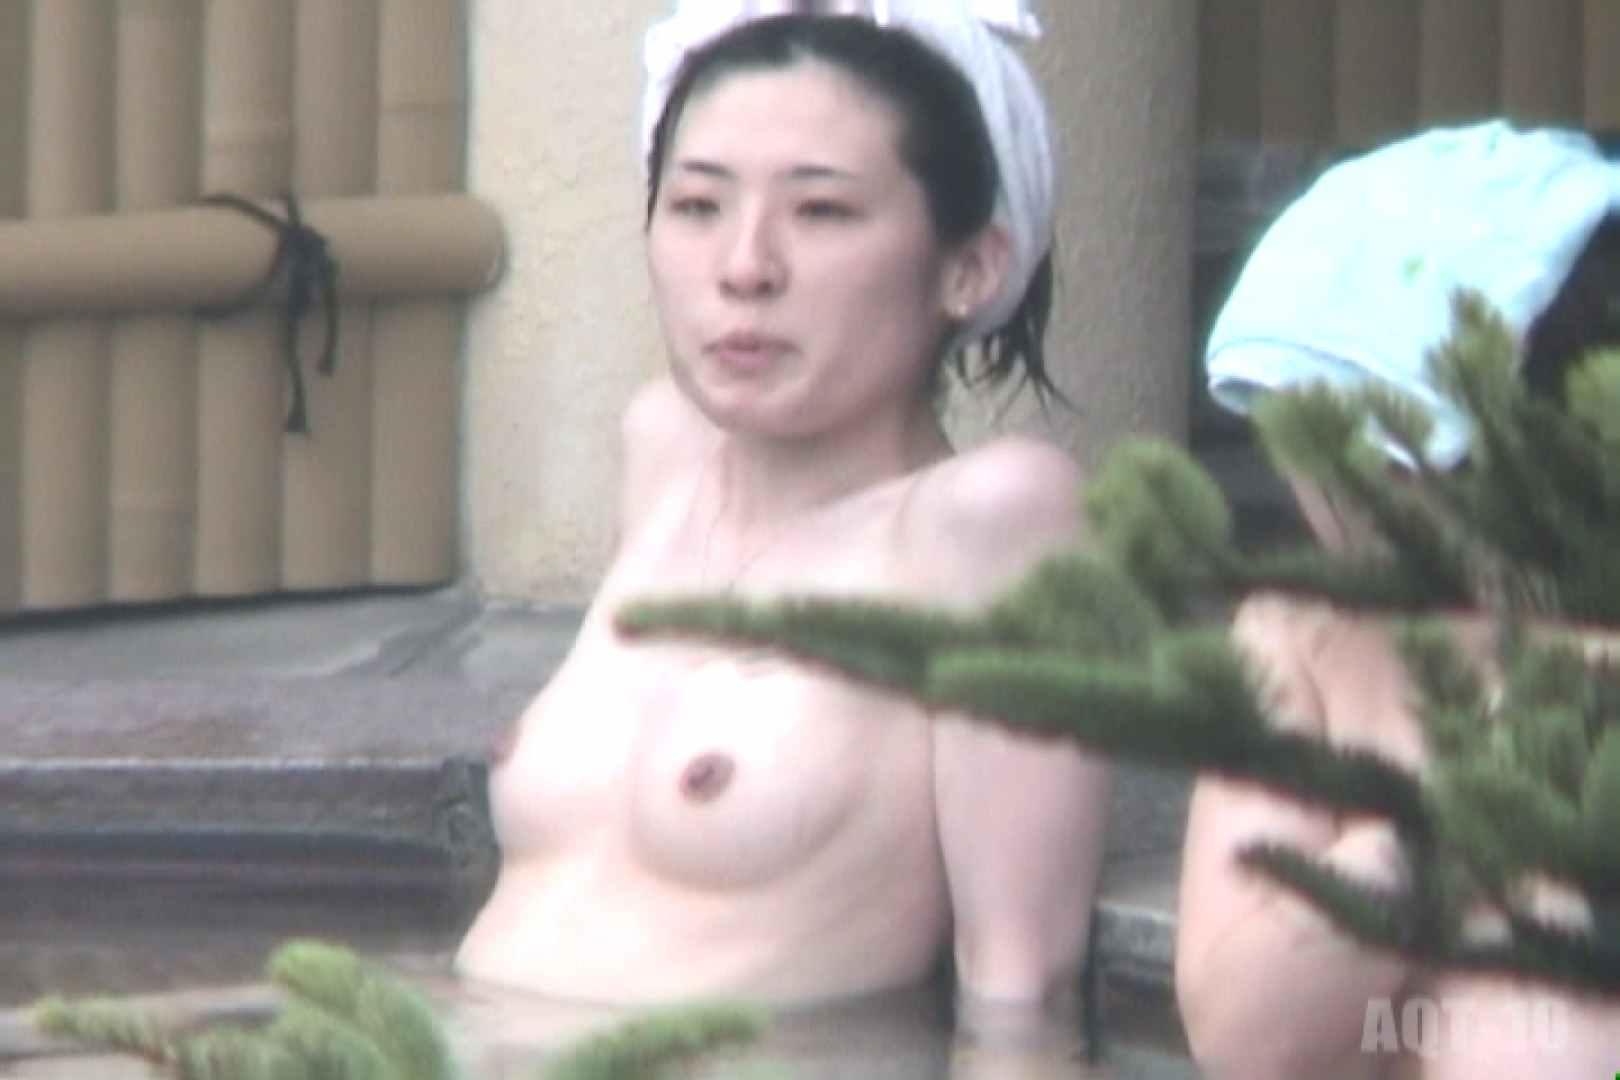 Aquaな露天風呂Vol.793 盗撮映像  72Pix 57